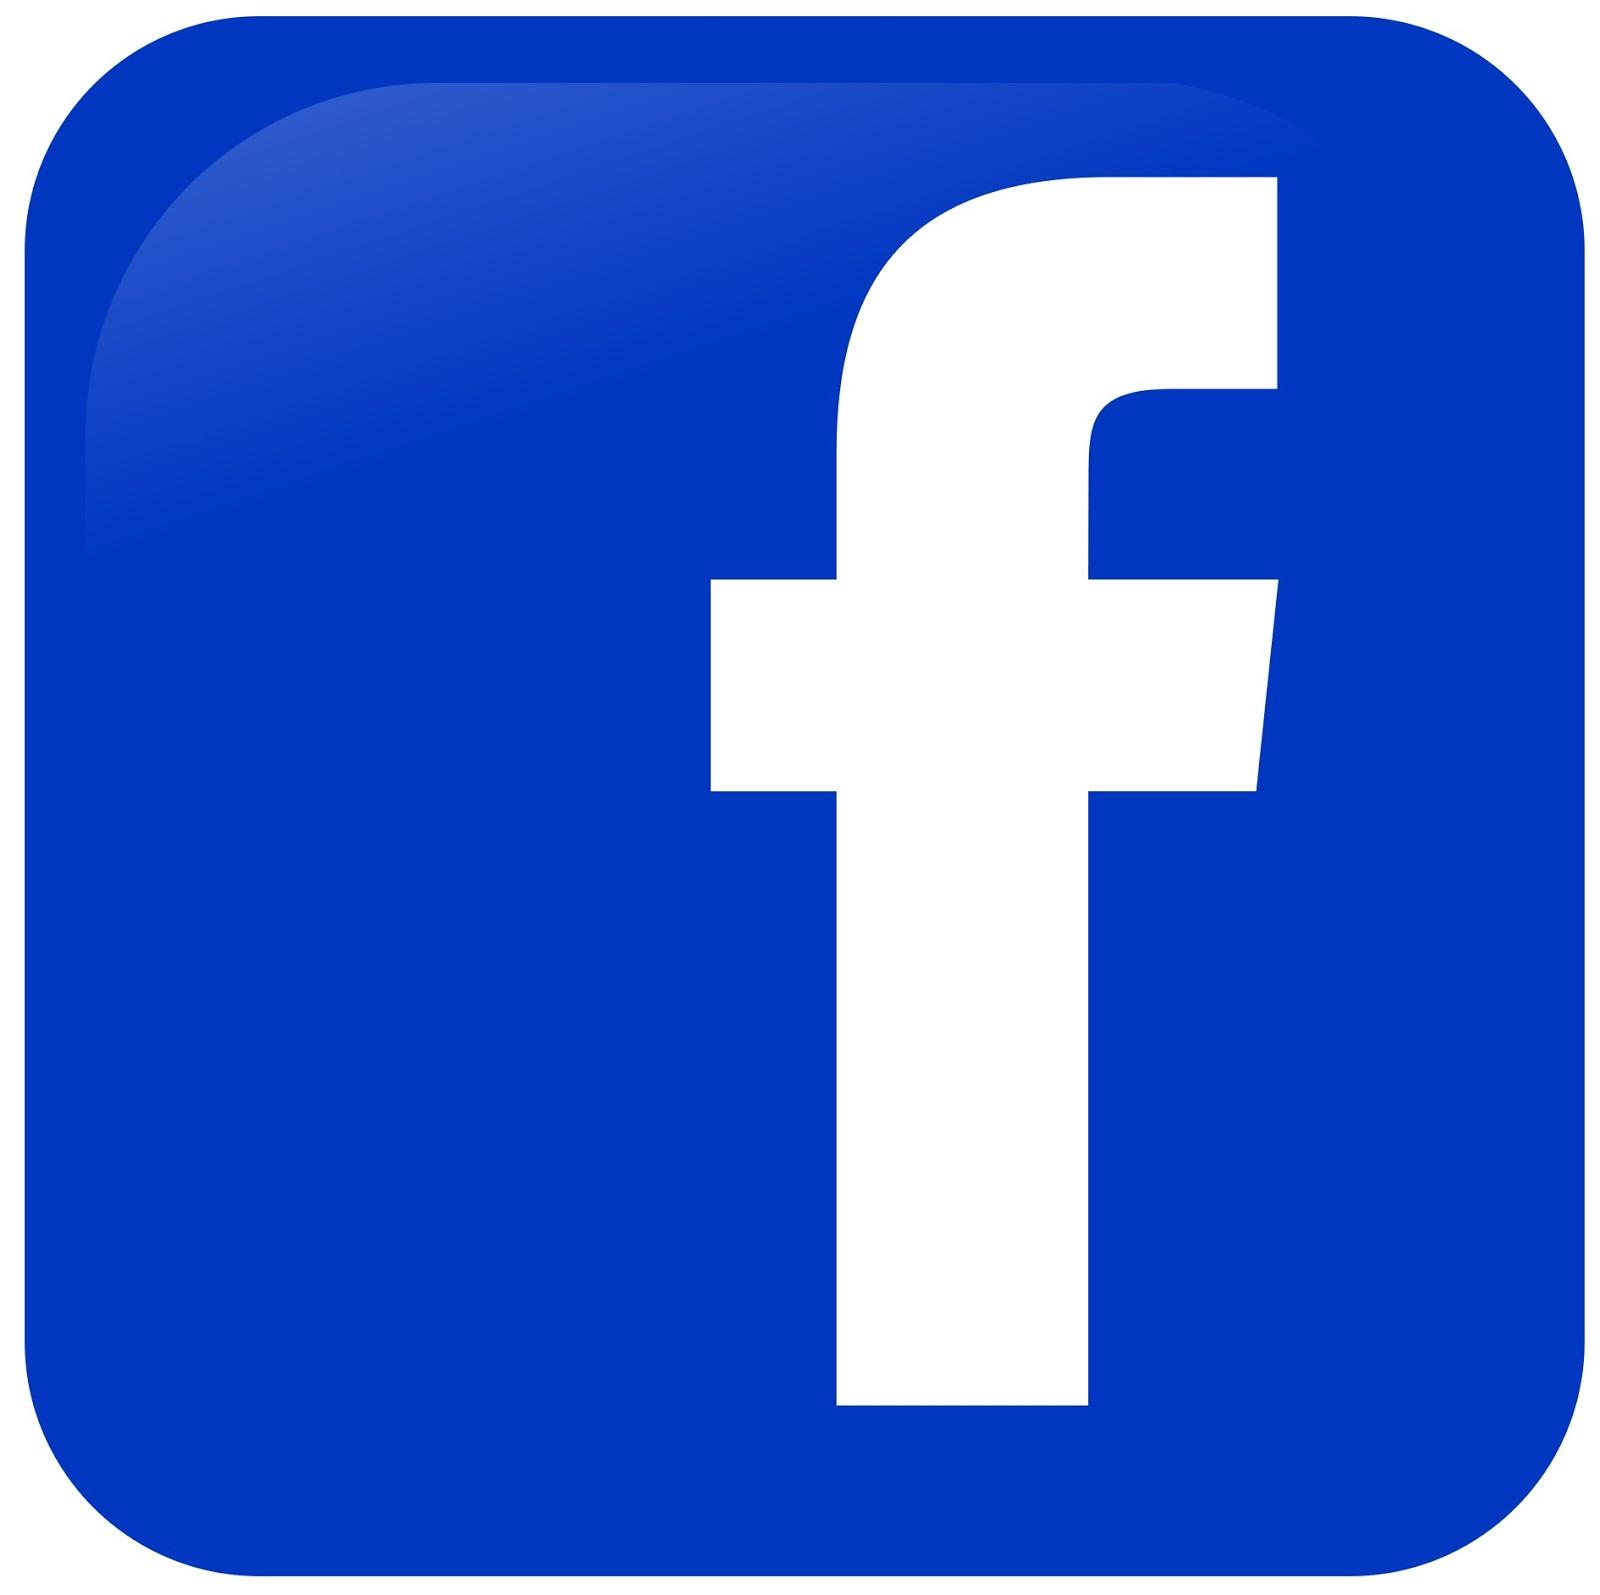 hight resolution of facebook logo vector free download